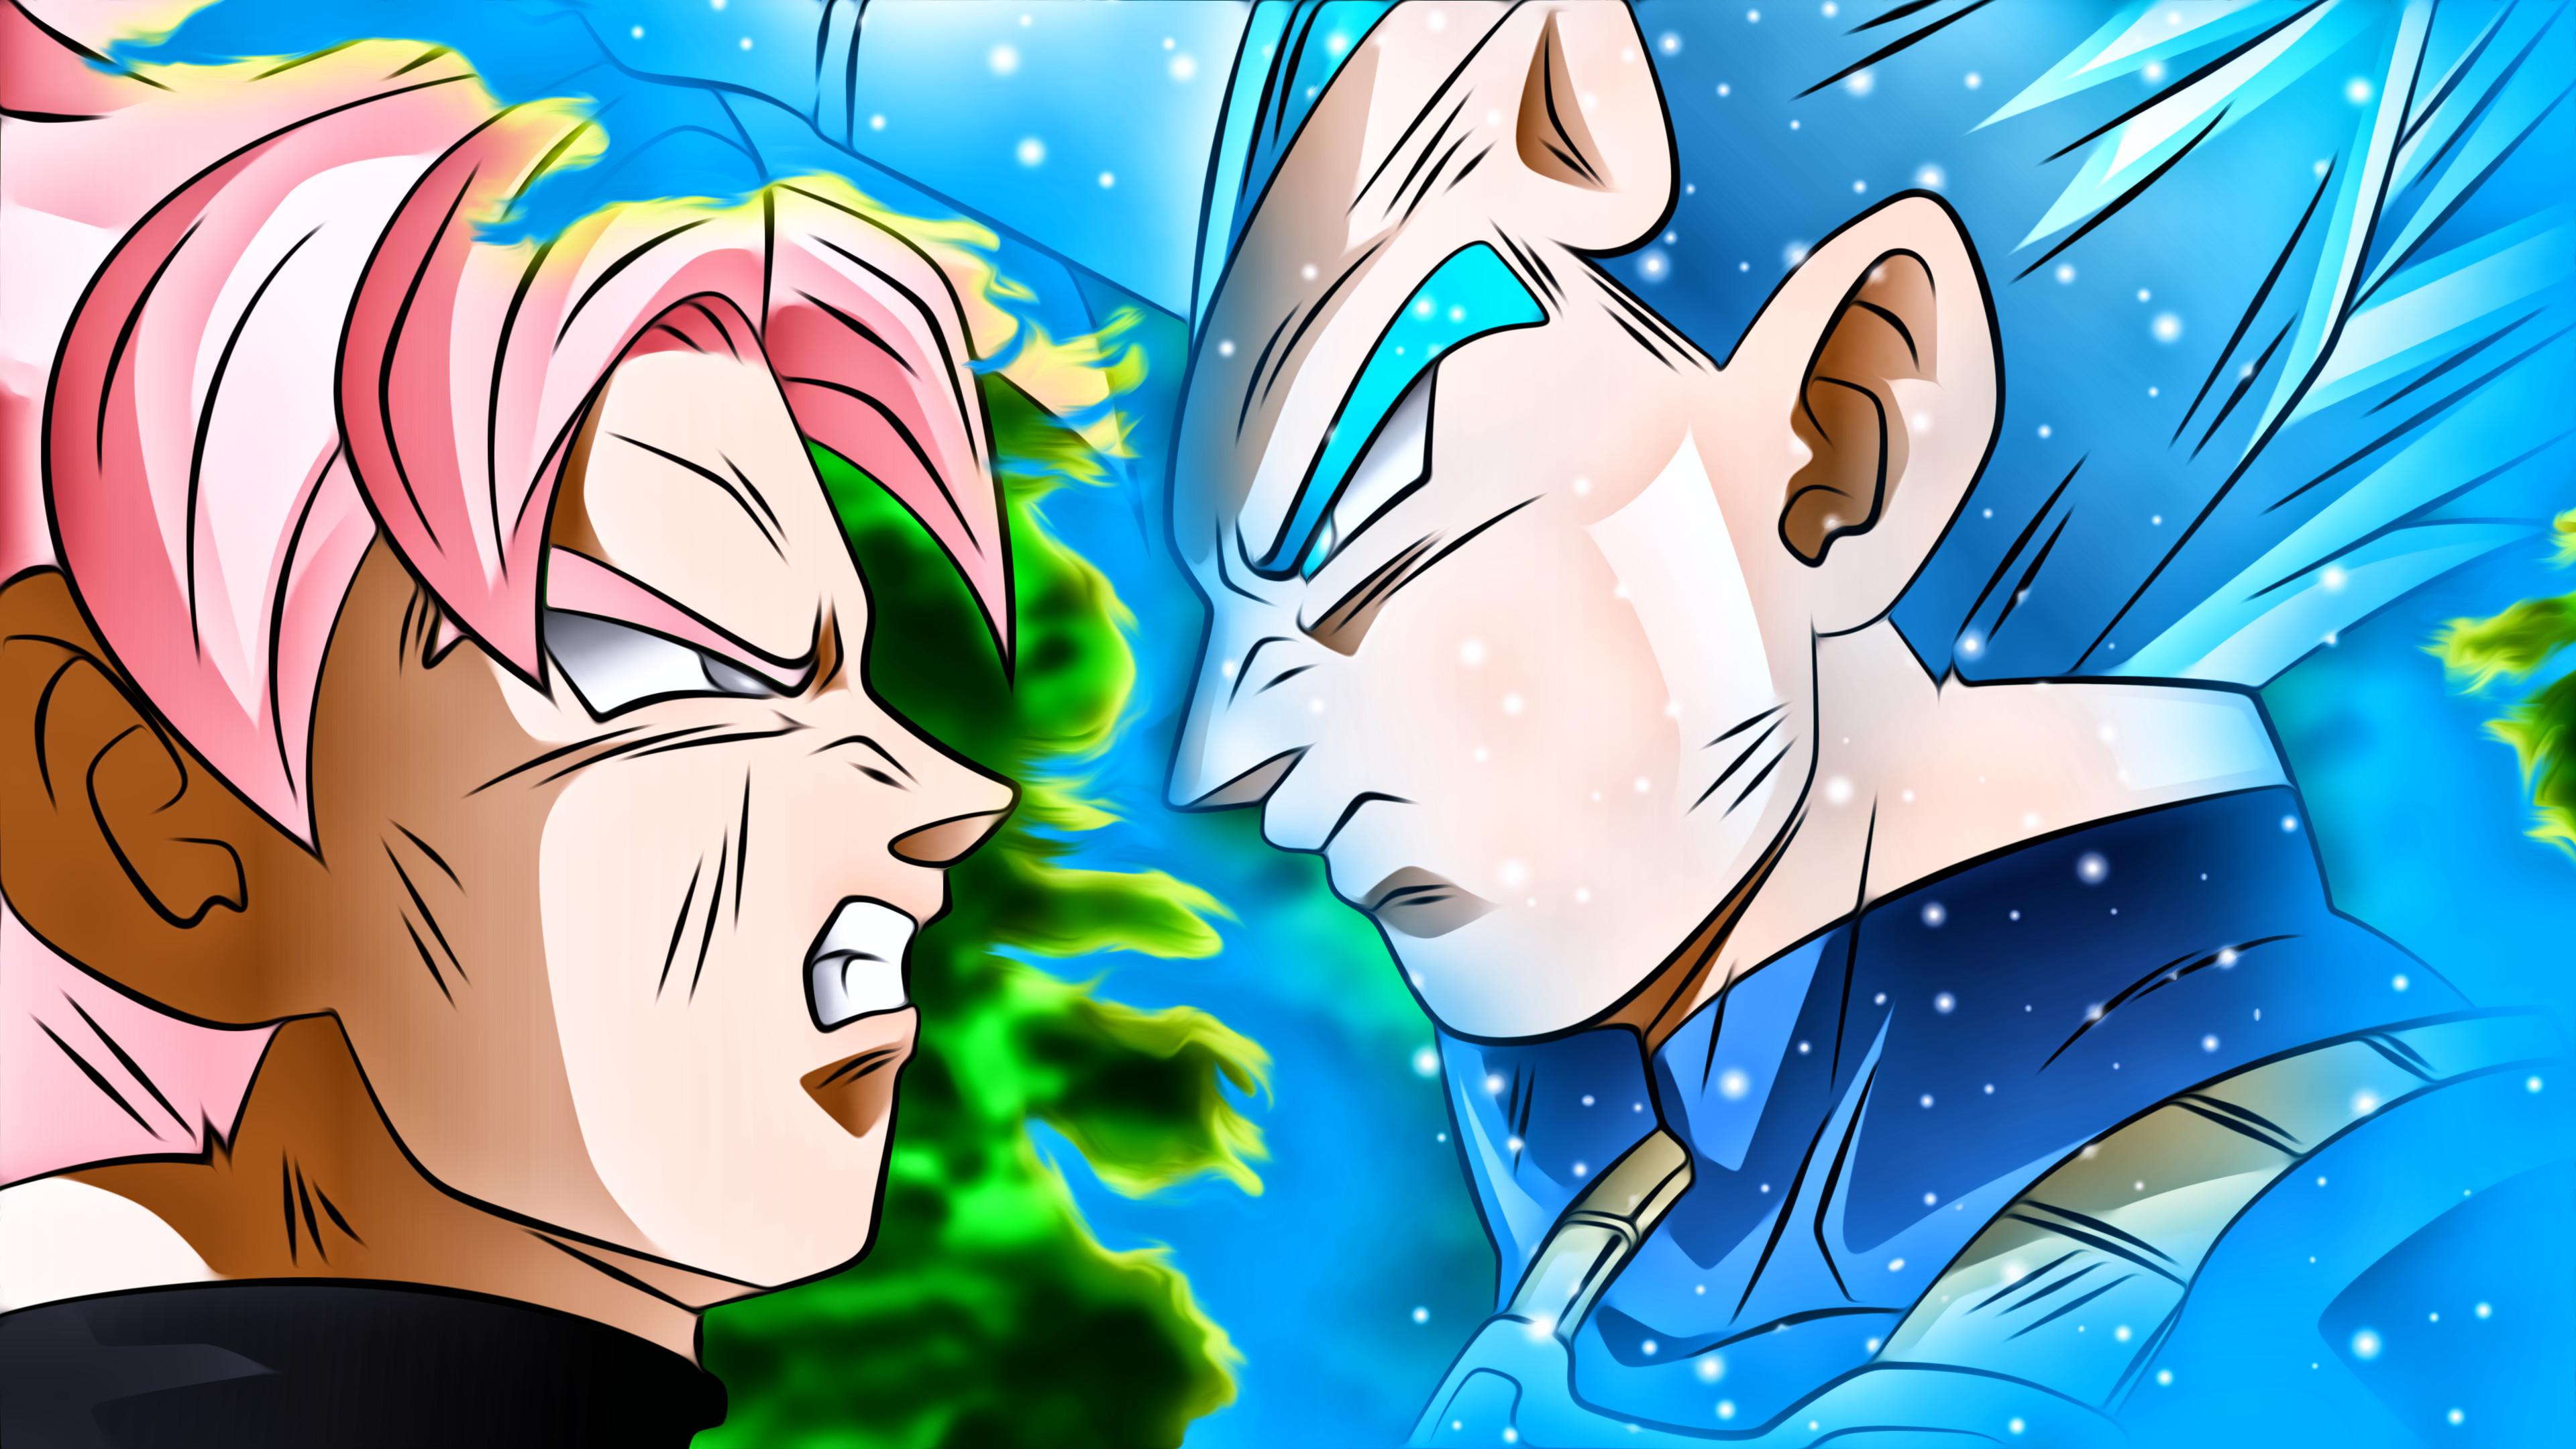 Dragon Ball Super Vegeta Ssgss Vegeta Black Dragon Vegeta Super Saiyan Blue Vs Goku Black 3840x2160 Wallpaper Teahub Io